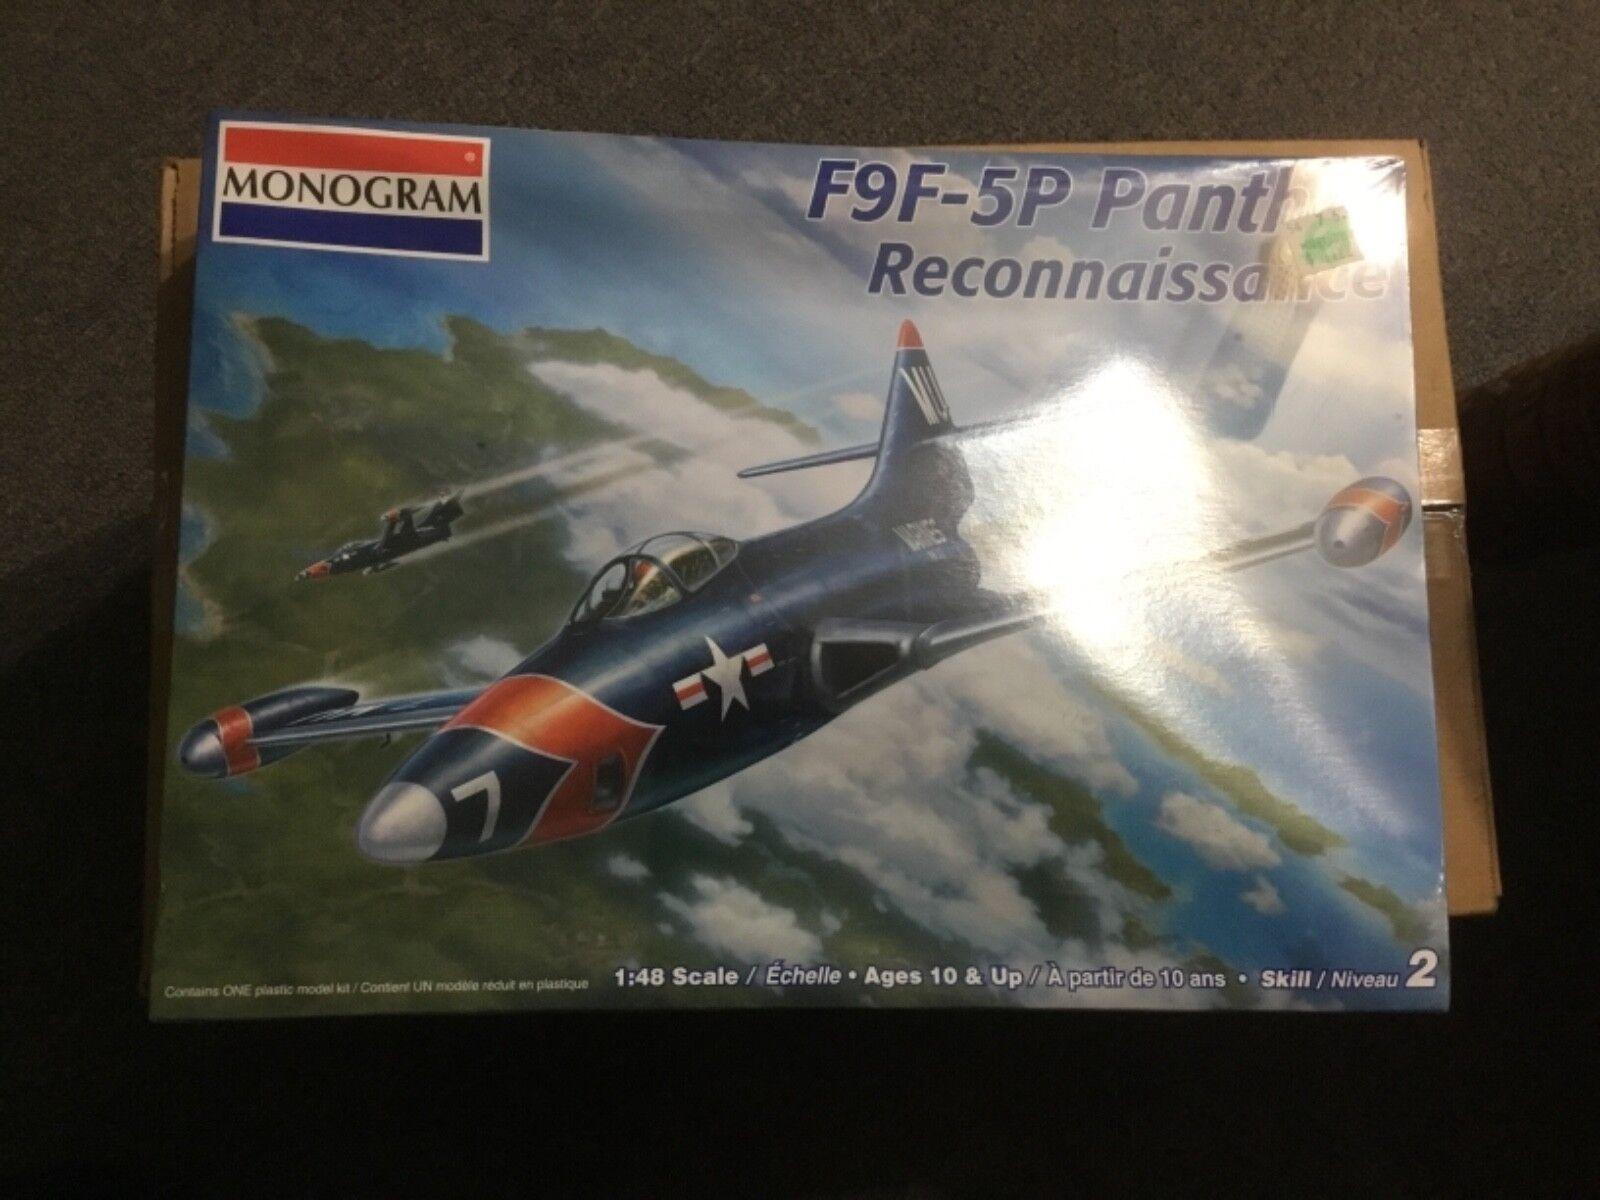 Monogram F9F-5P Panther Reconnaissance  1 48 scale Model Kit